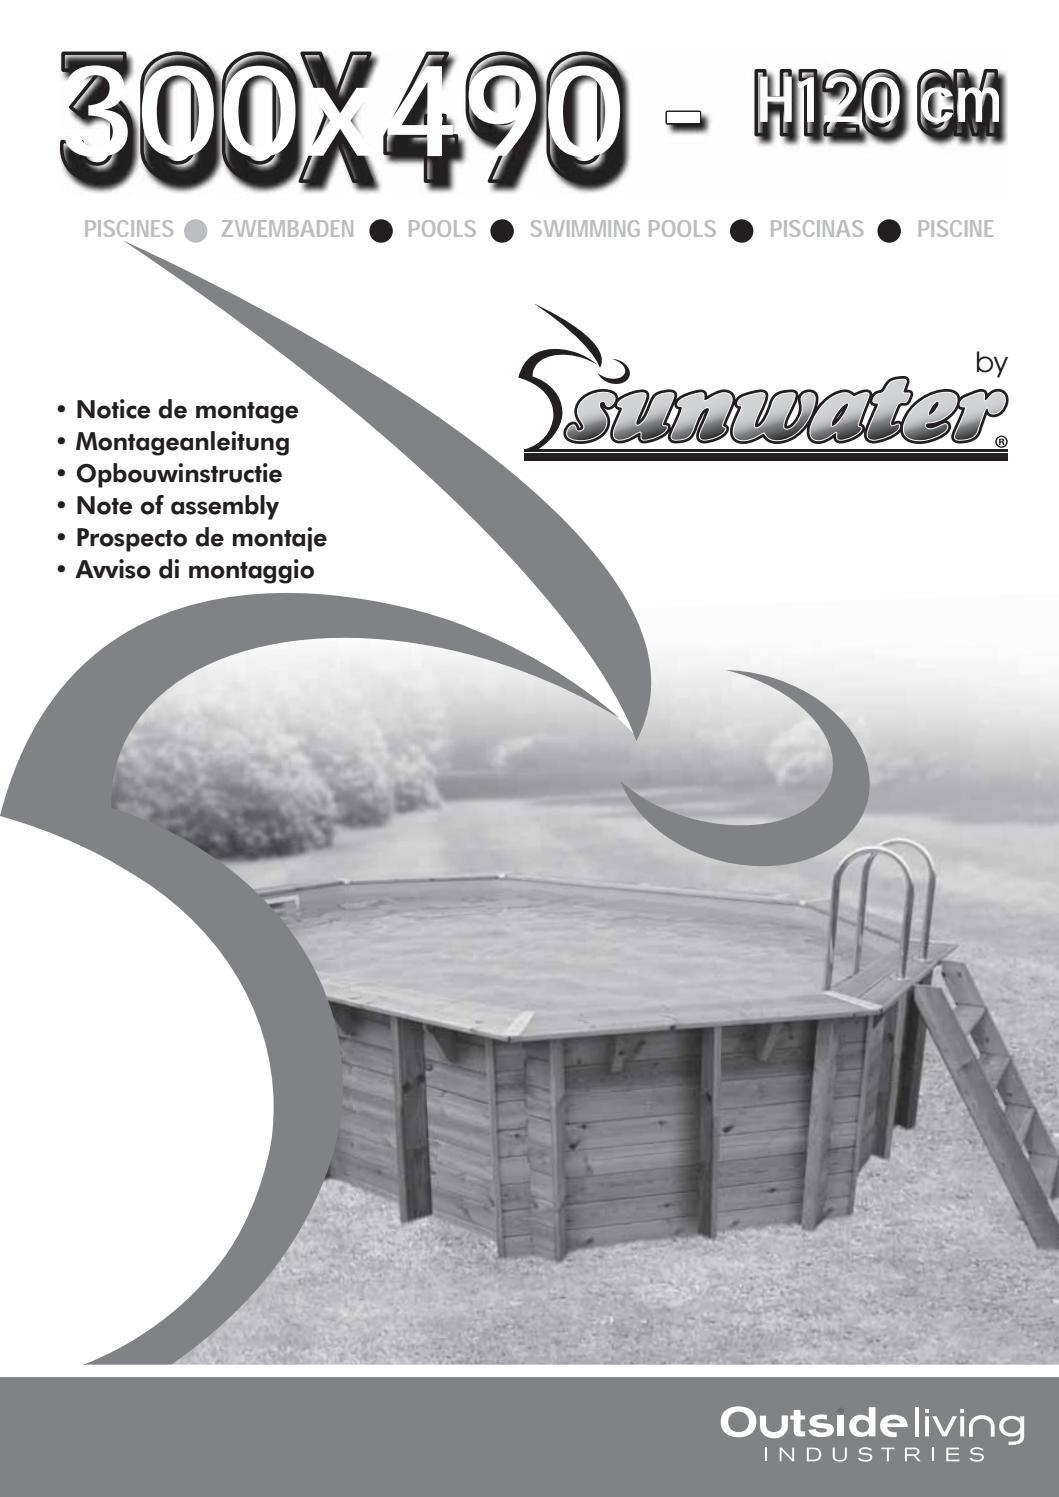 Notice 300X490 - H120-2018_1 Sunwater K.pdf By ____ - Issuu intérieur Chloramine Piscine